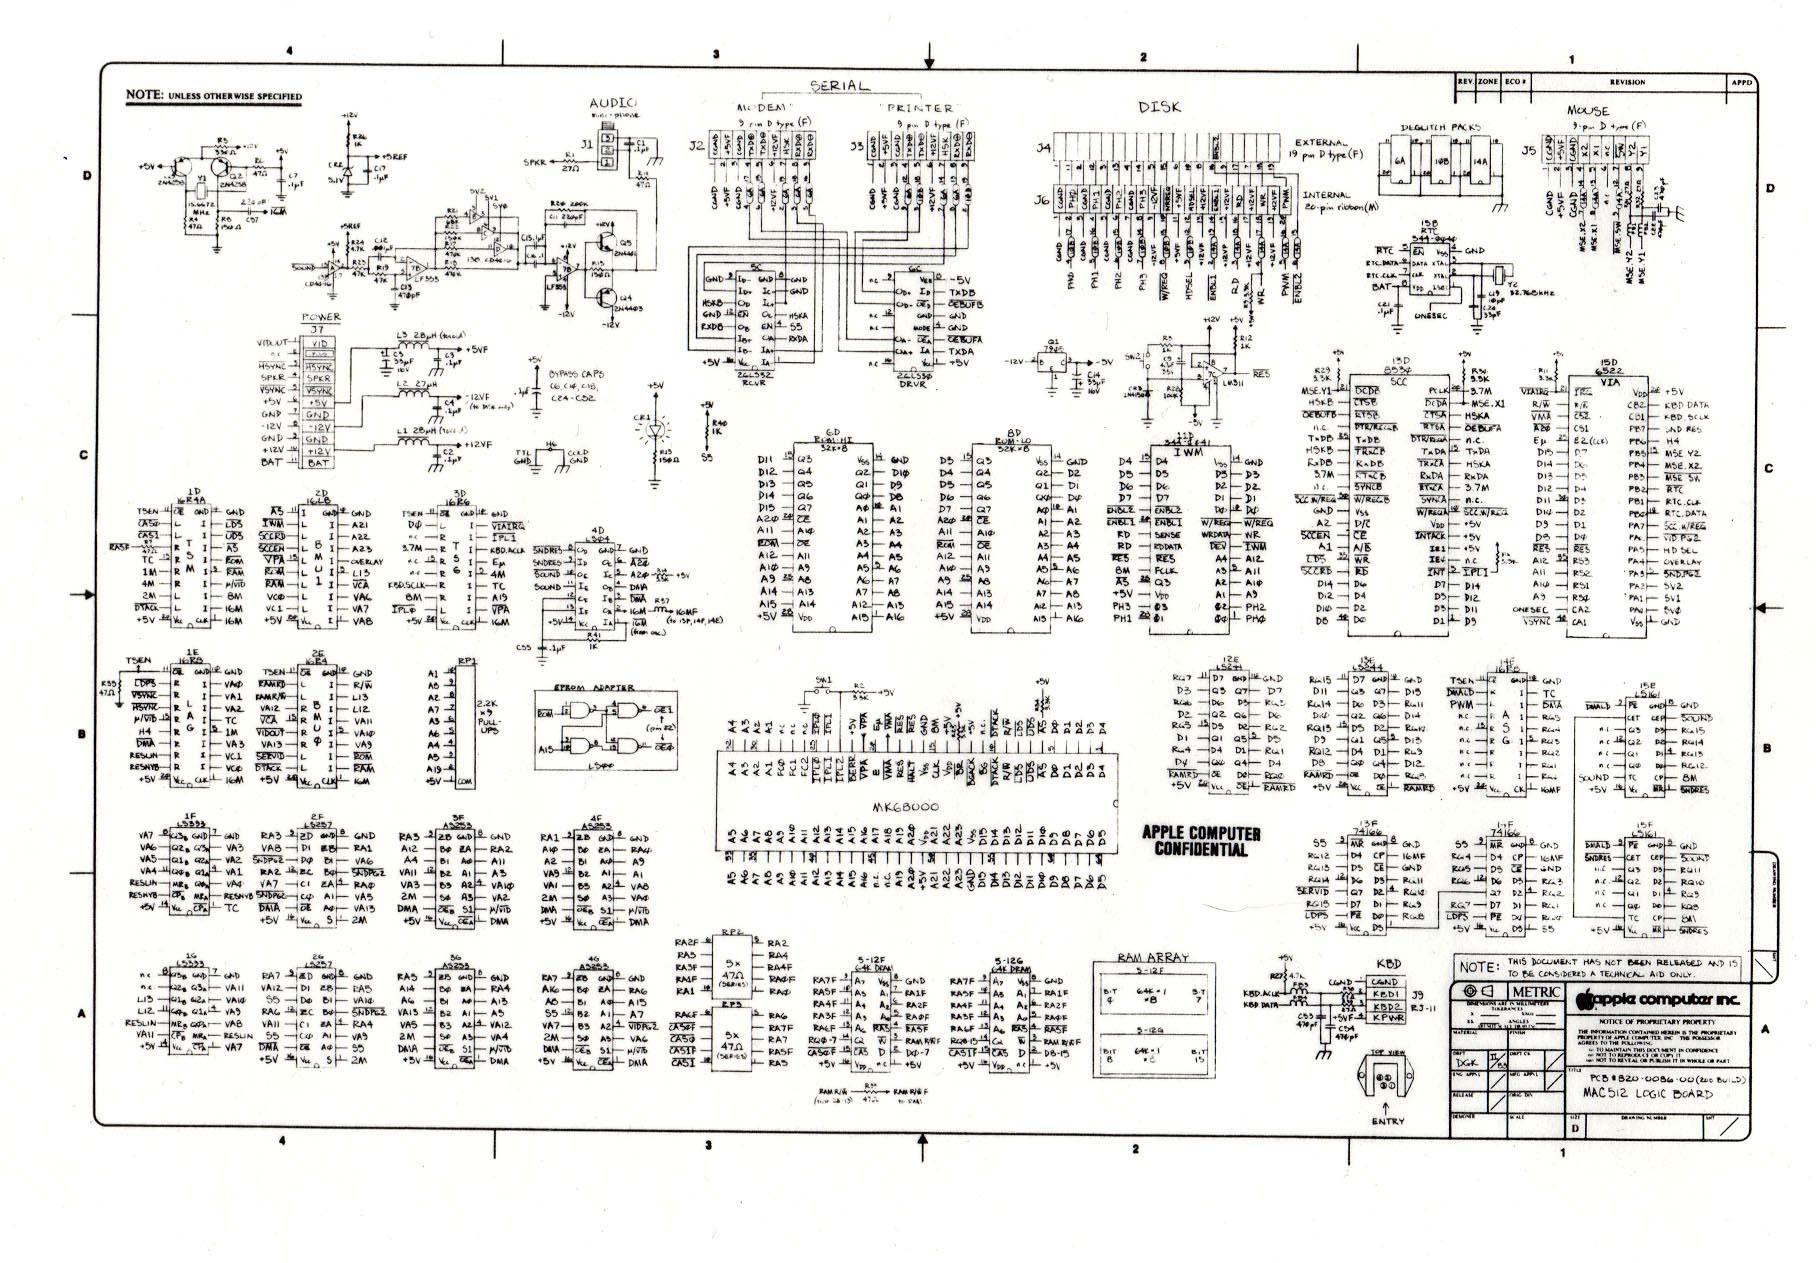 DigiBarn Diagrams: Original Macintosh 512K Logic Board